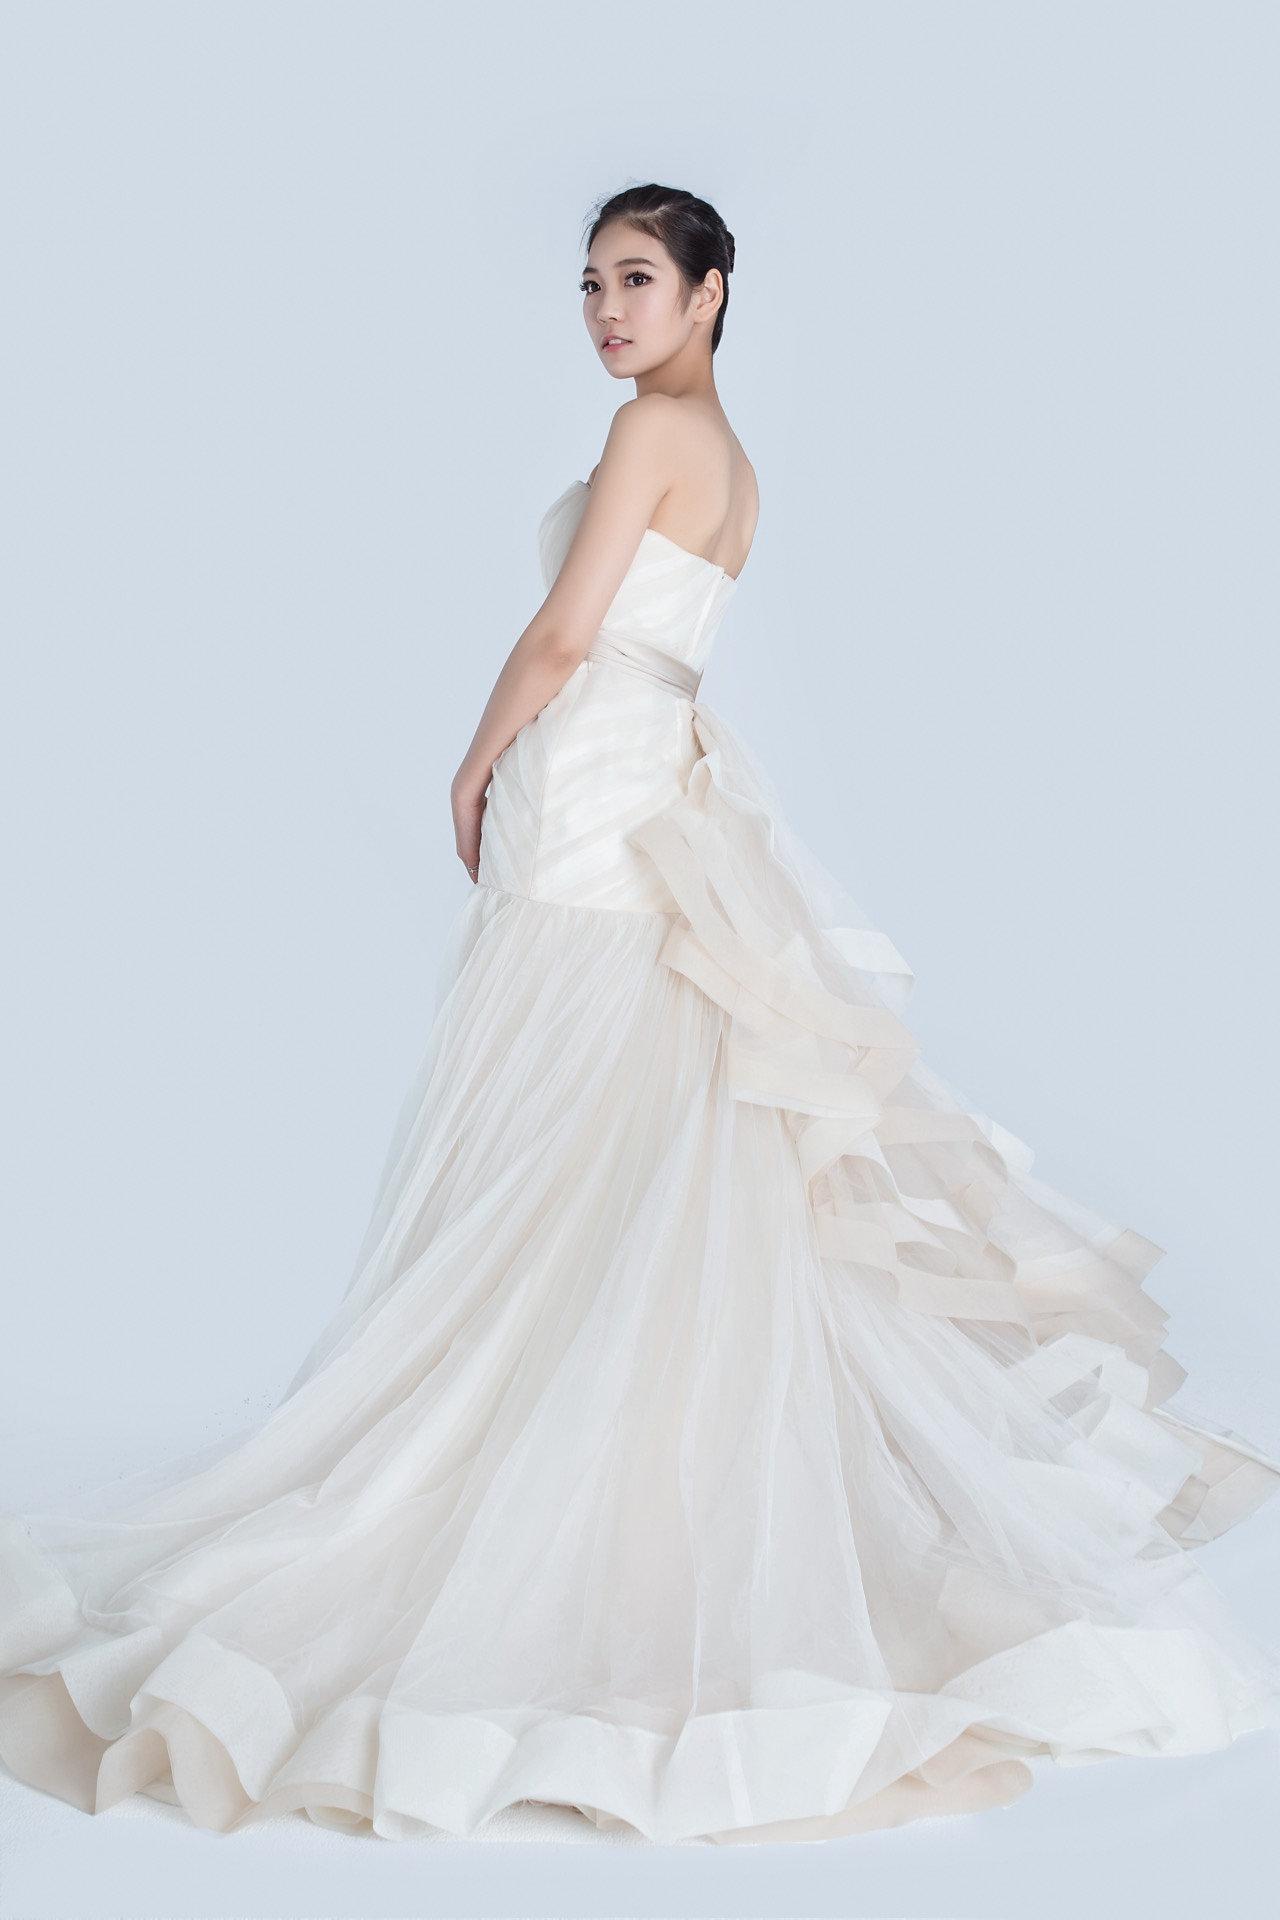 lz bridal designer wedding dress rental White by vera wang